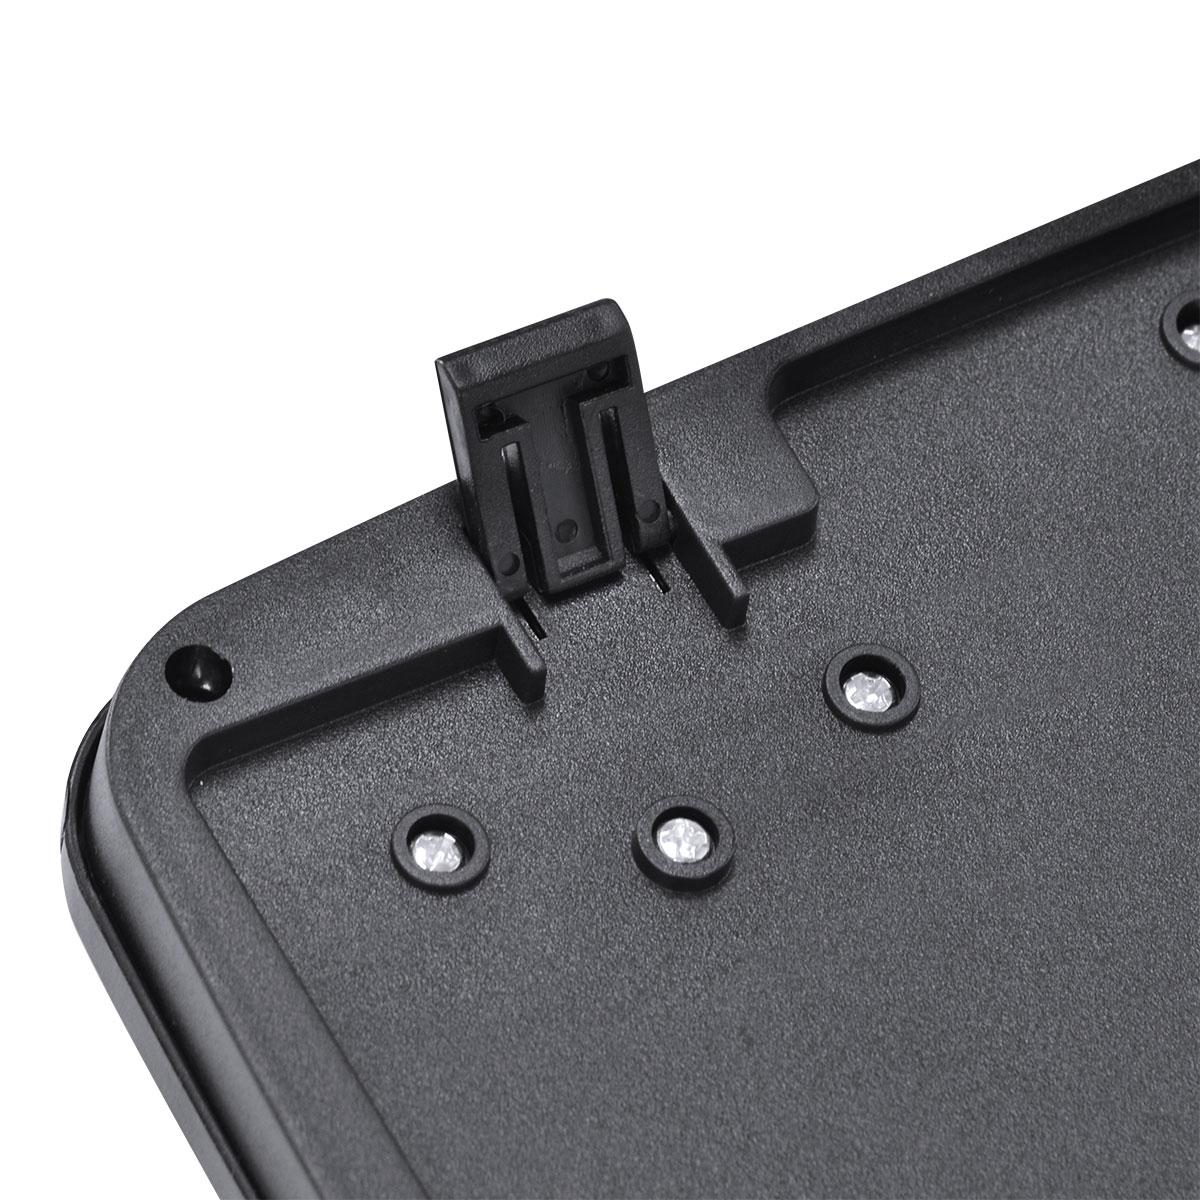 Kit de Teclado USB + Mouse USB + Mouse Pad